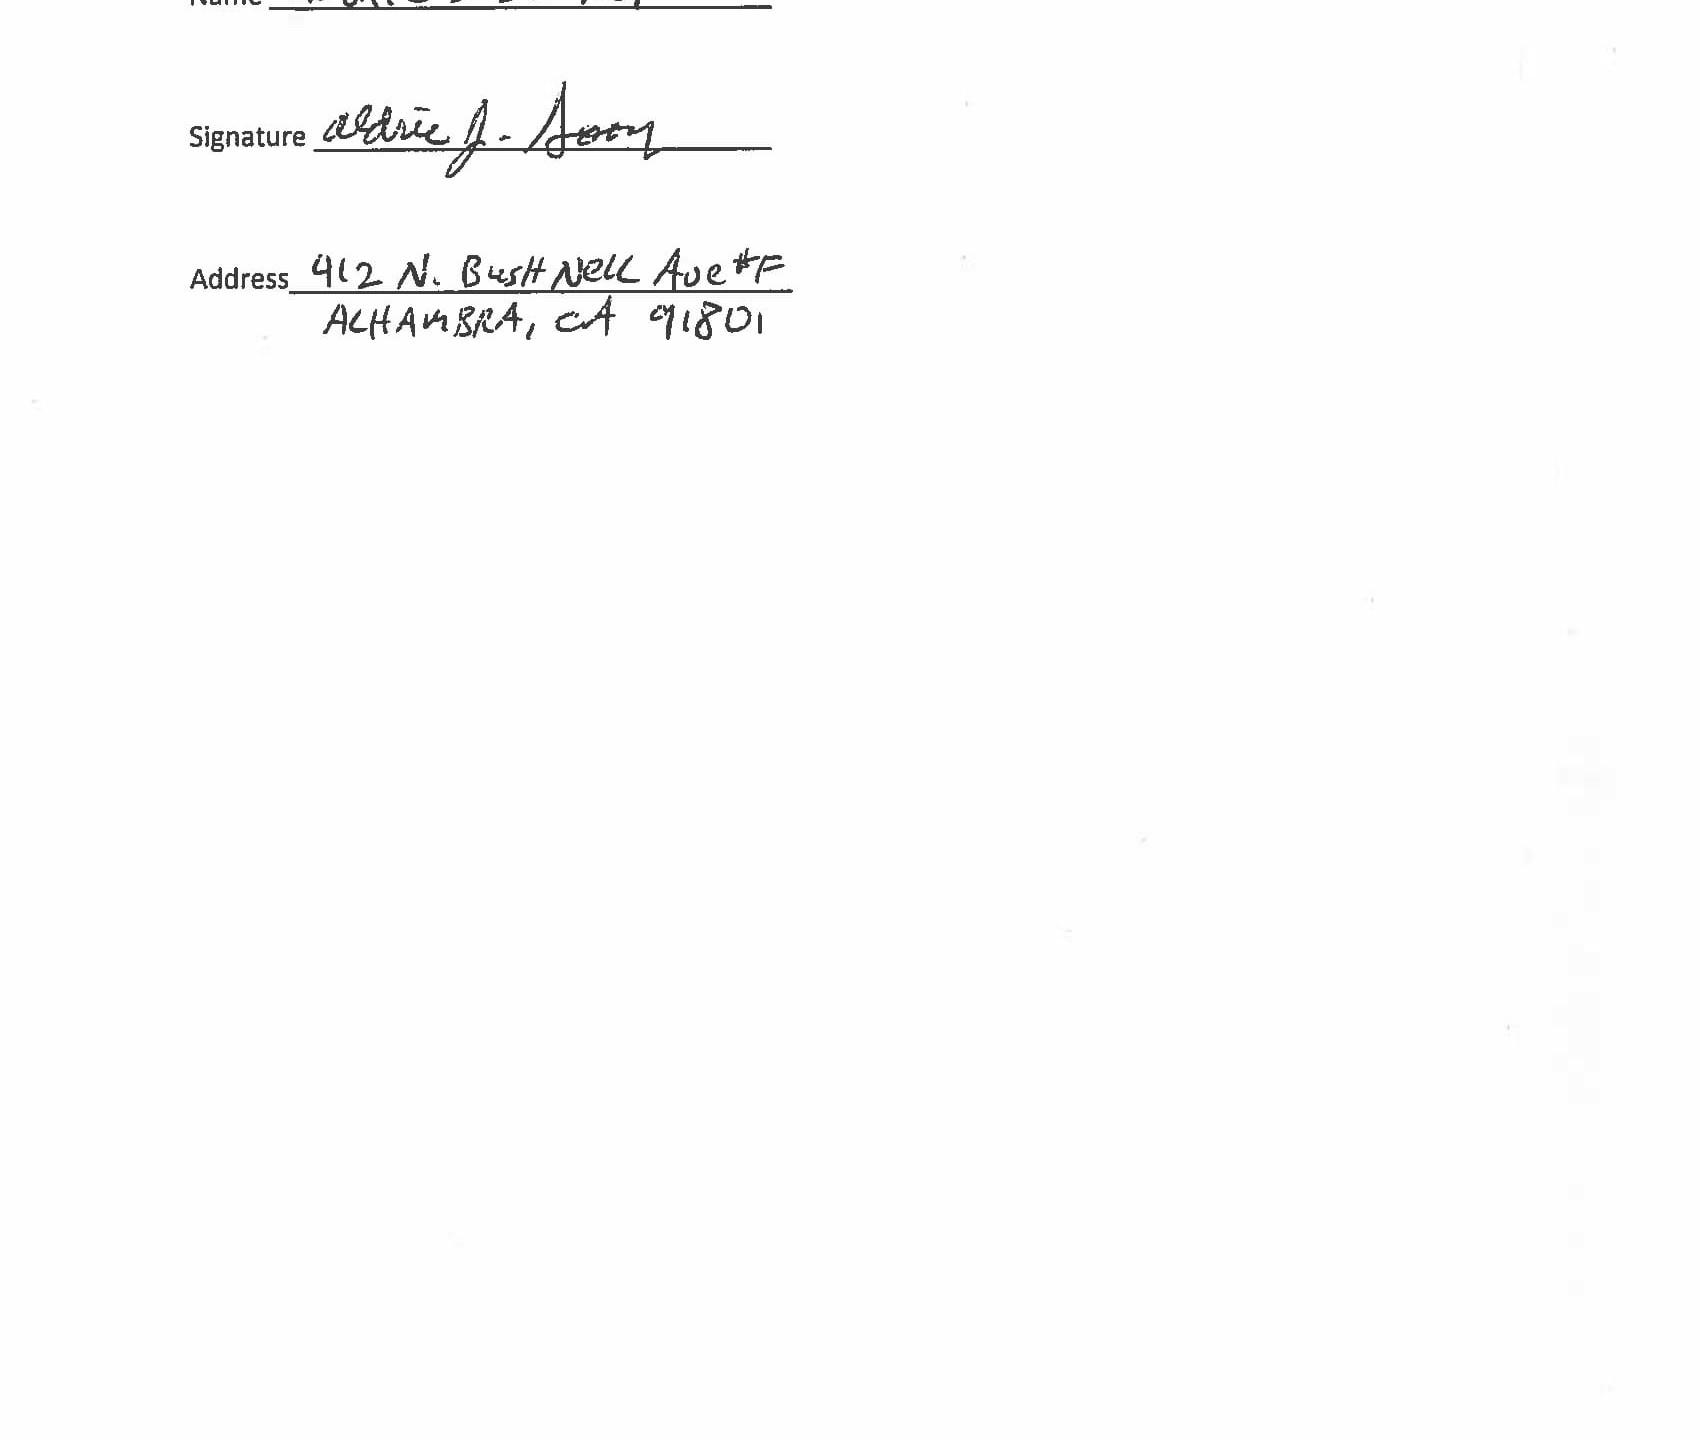 Initiative paperwork stamped by city clerk-05